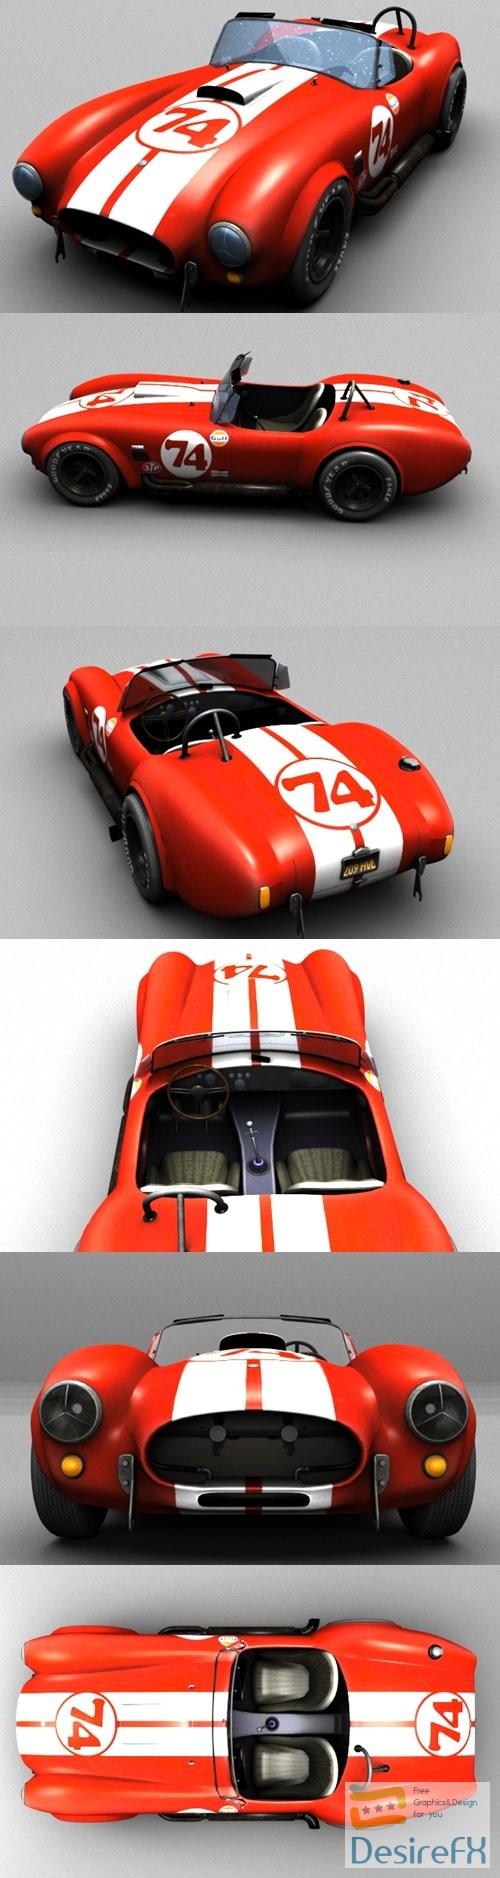 3d-models - Shelby Cobra 427 1966 3D Model